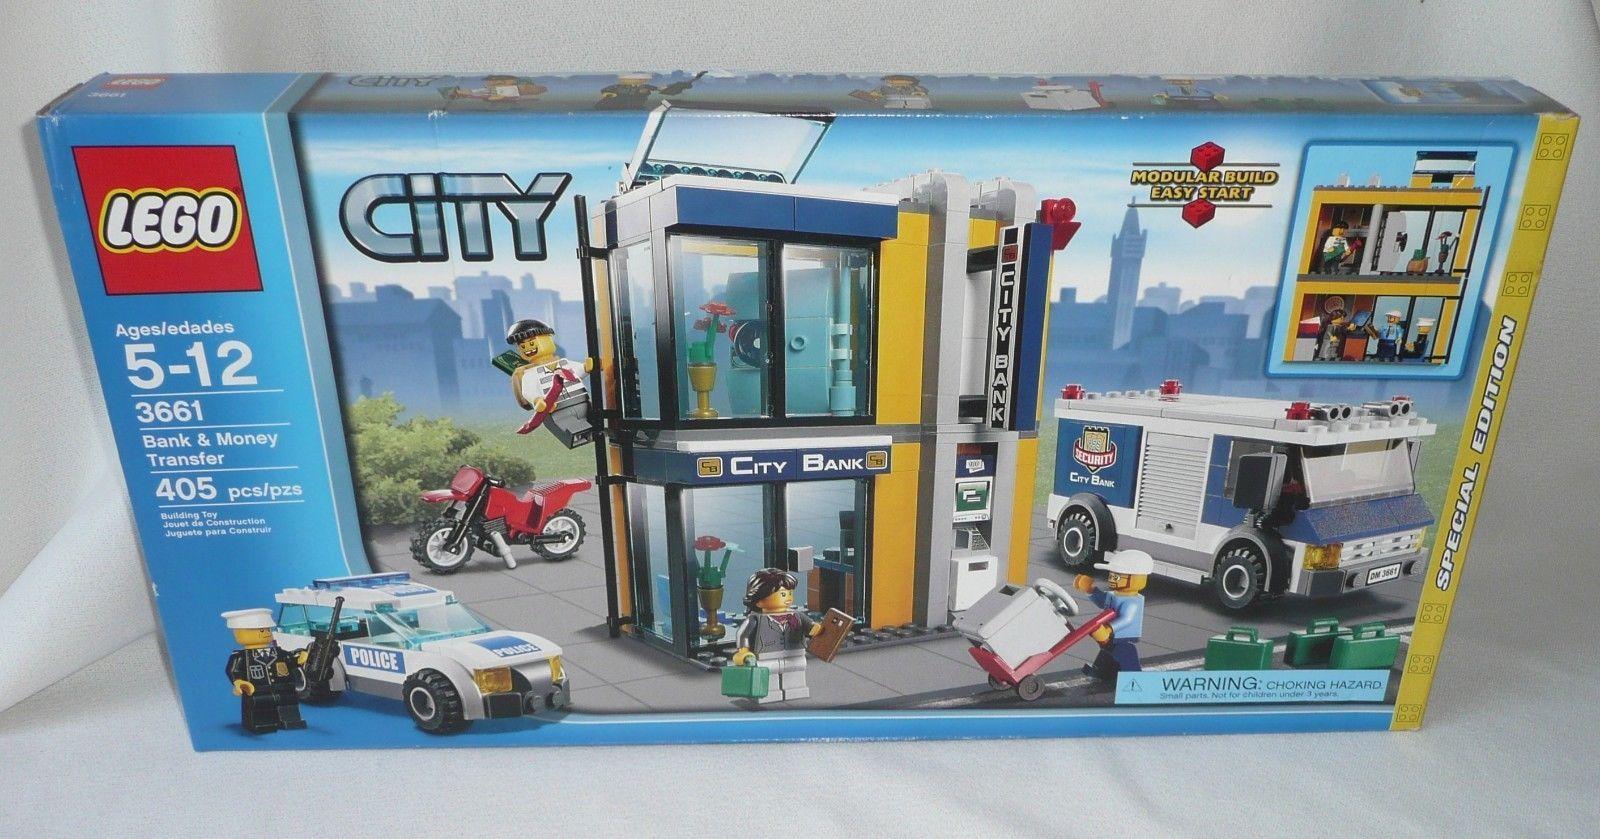 Lego City Police 3661 Bank Money Transfer Nib Lego City